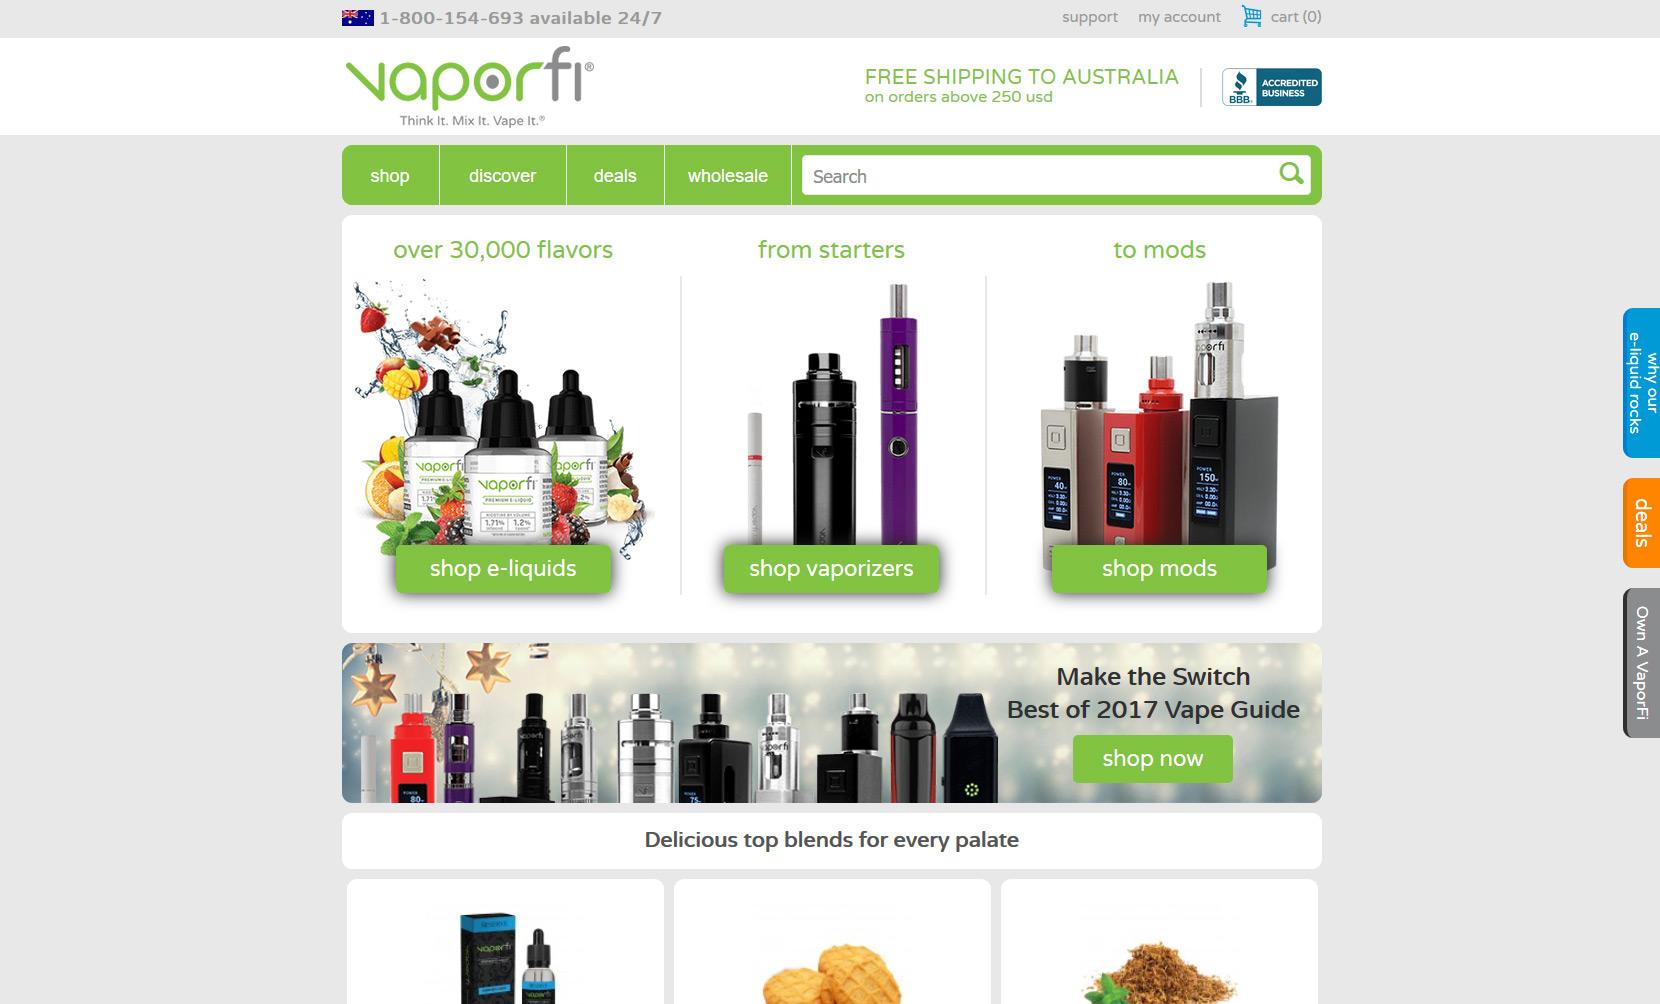 VaporFi Australia - Best Places to Buy E-Liquid: VaporFi